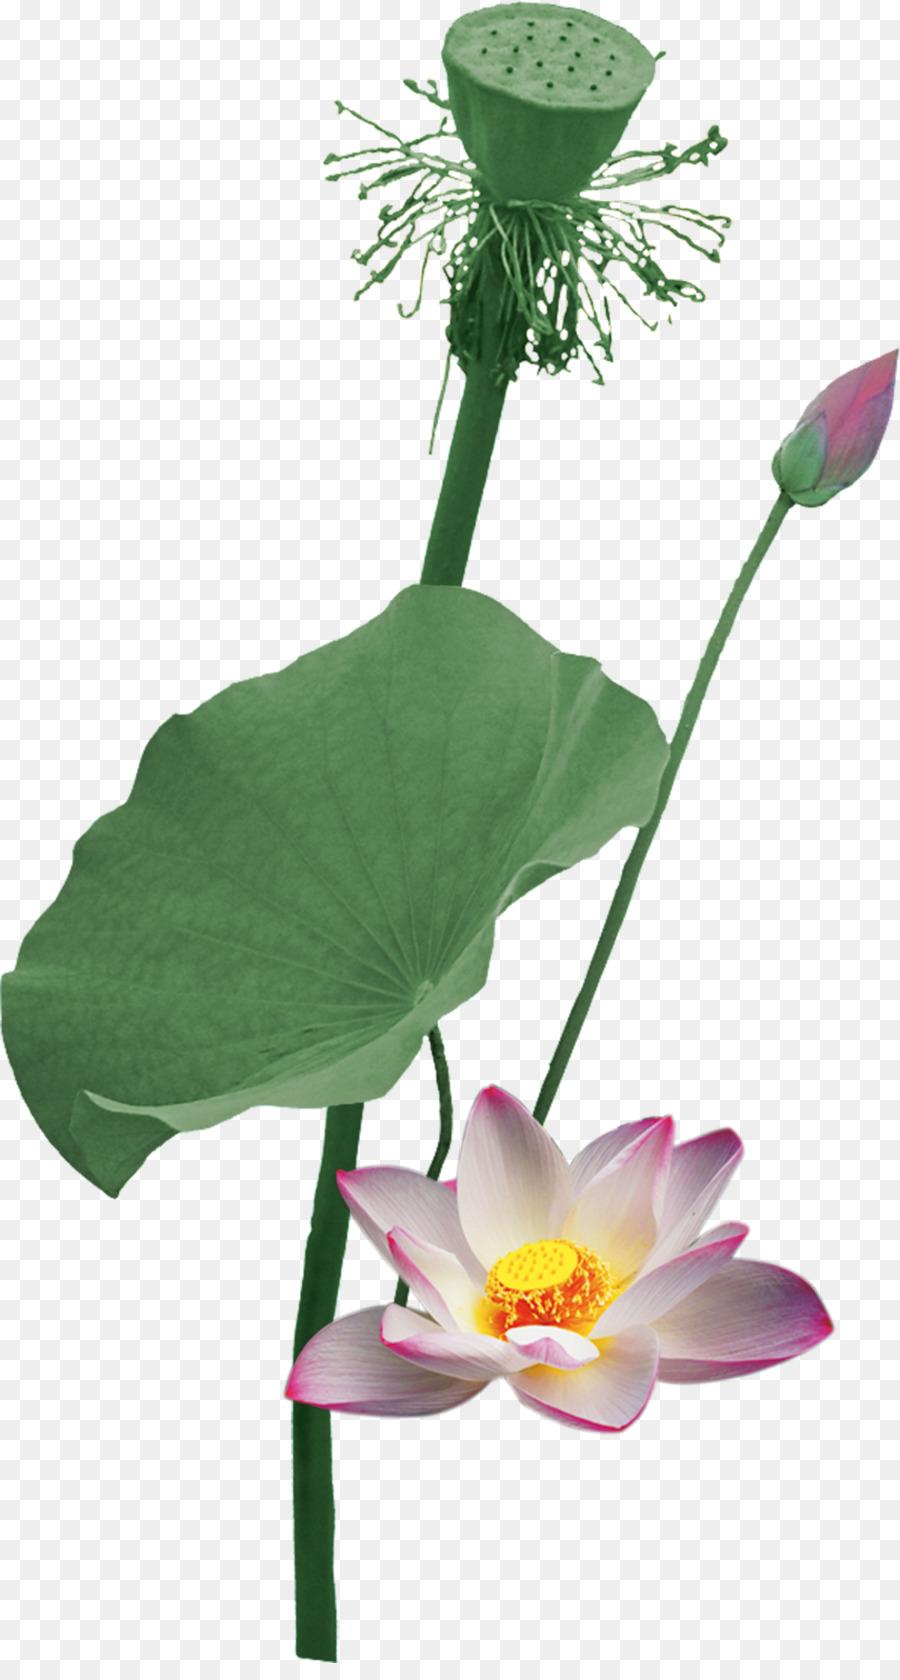 Nelumbo Nucifera Flowers And Guns Lotus Root Summer Lotus Vector